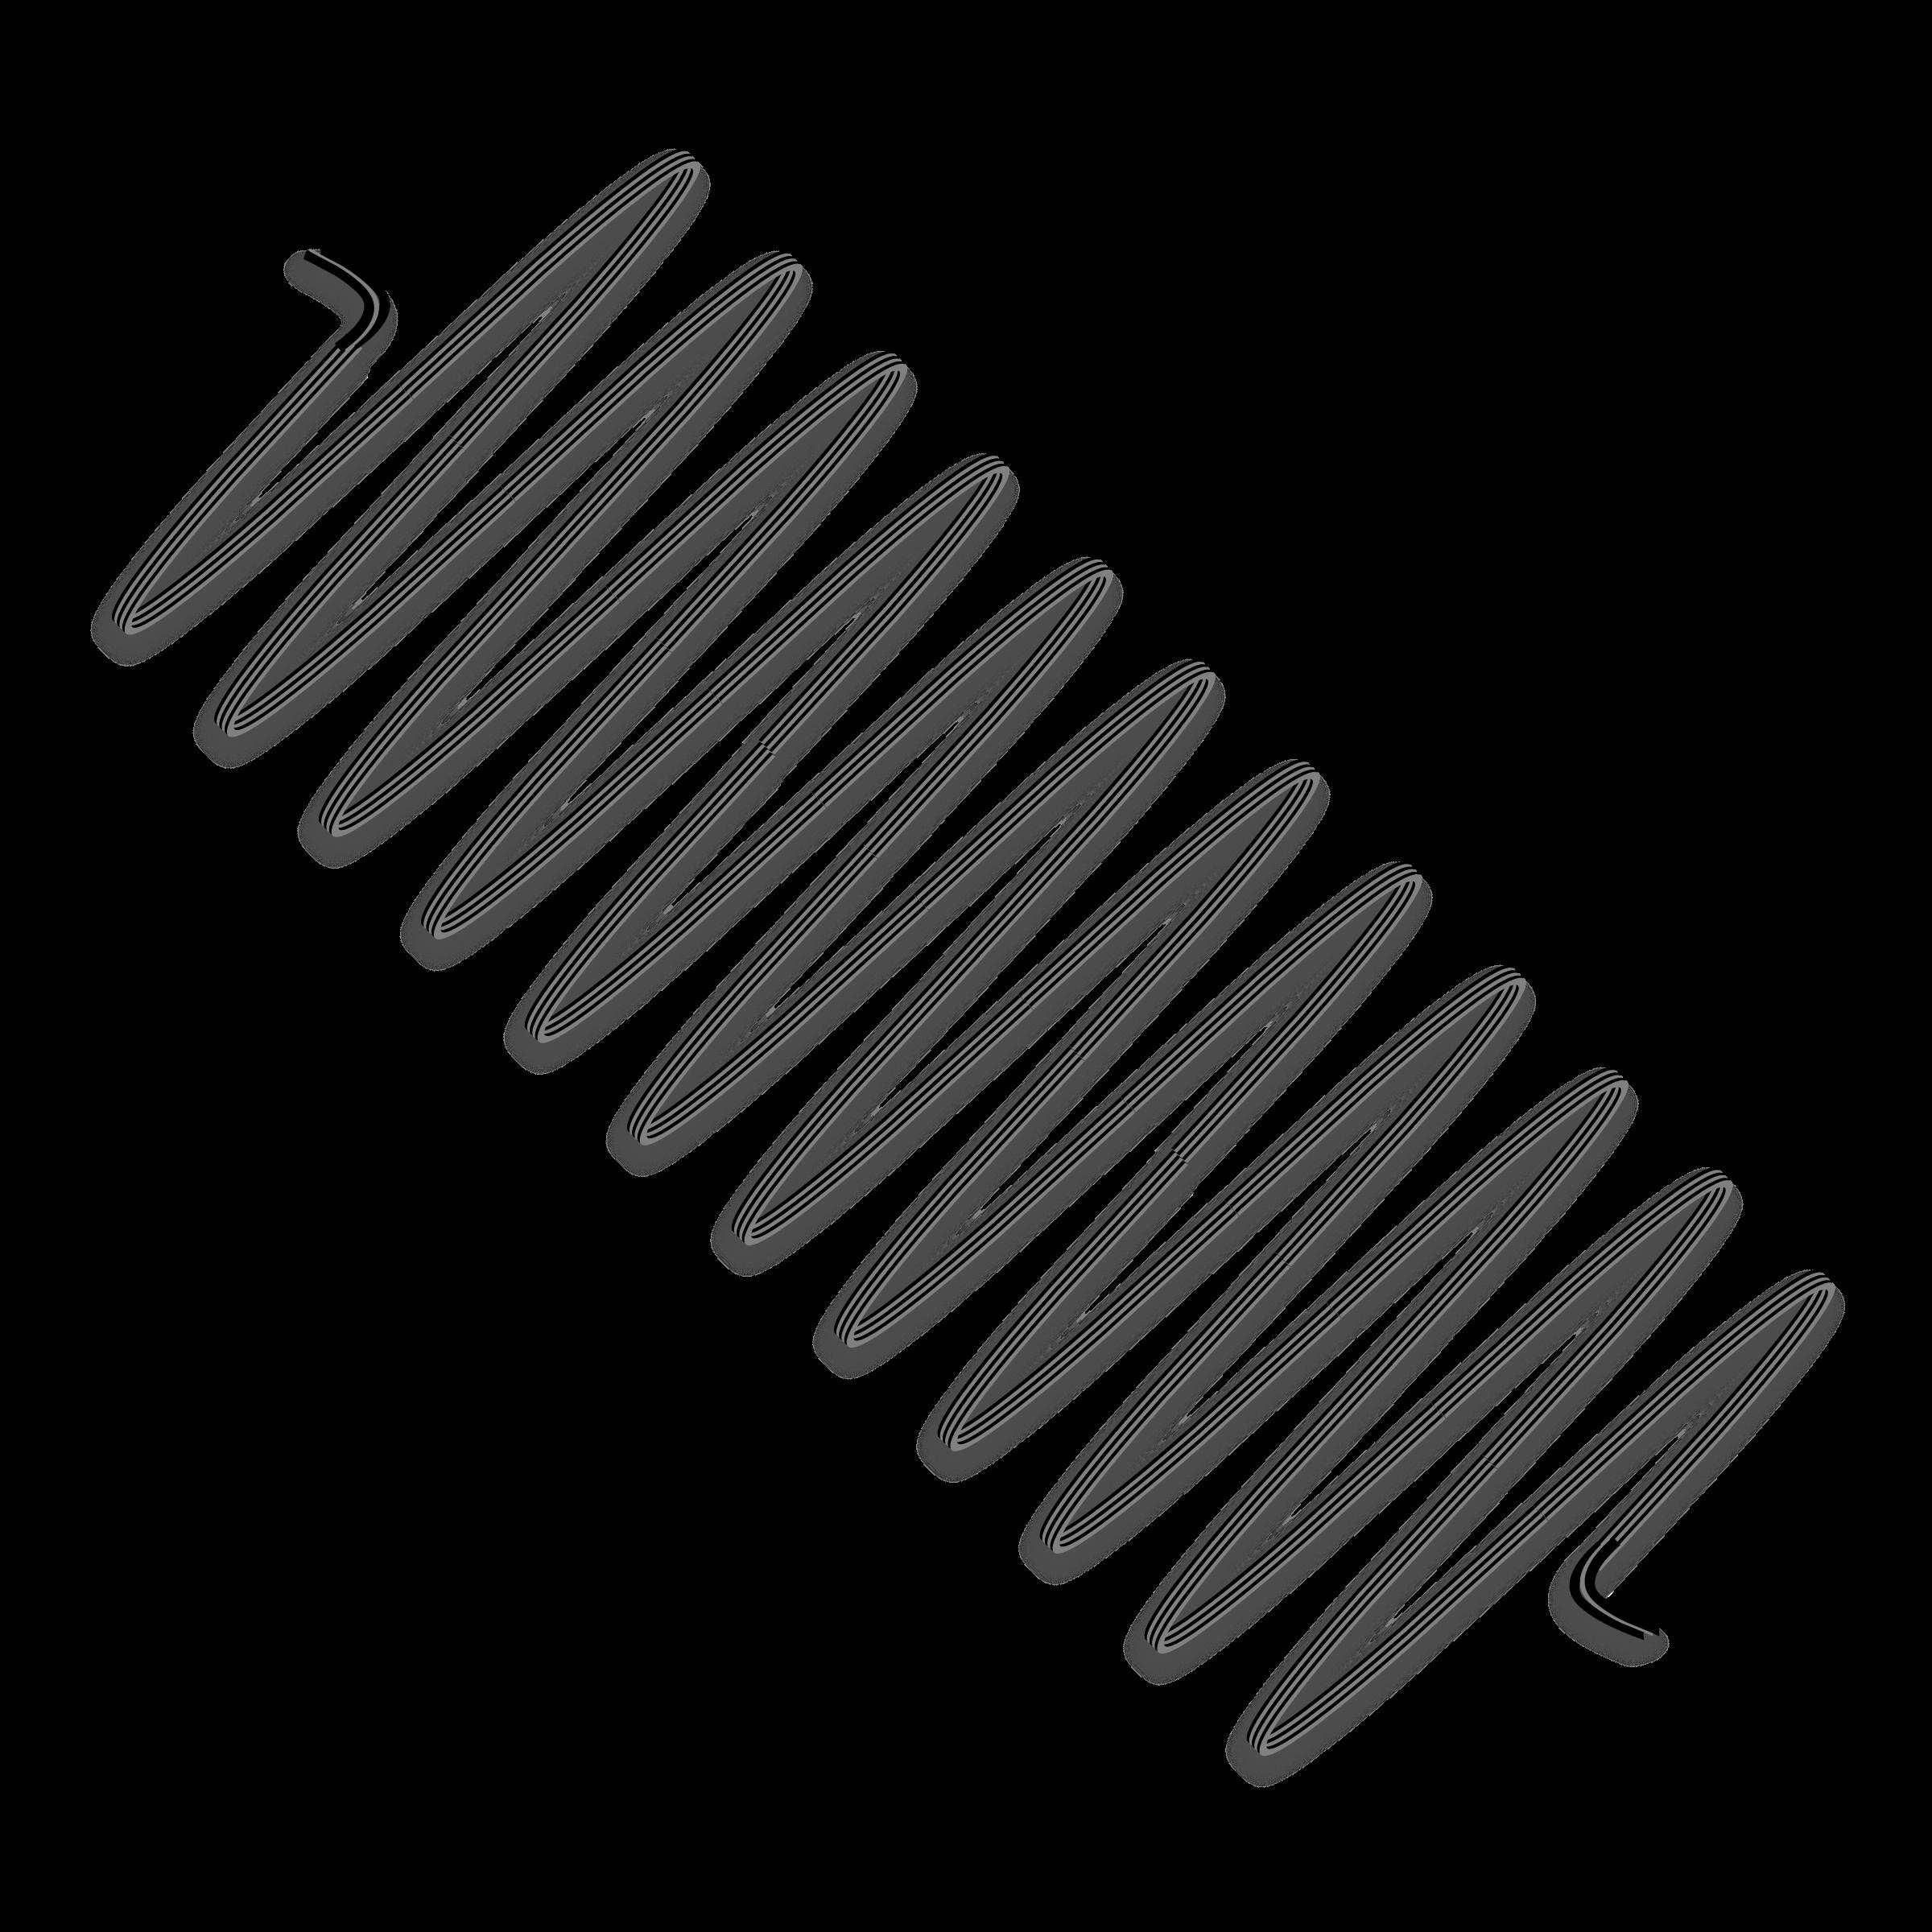 clip art transparent stock spring transparent tool #103619110